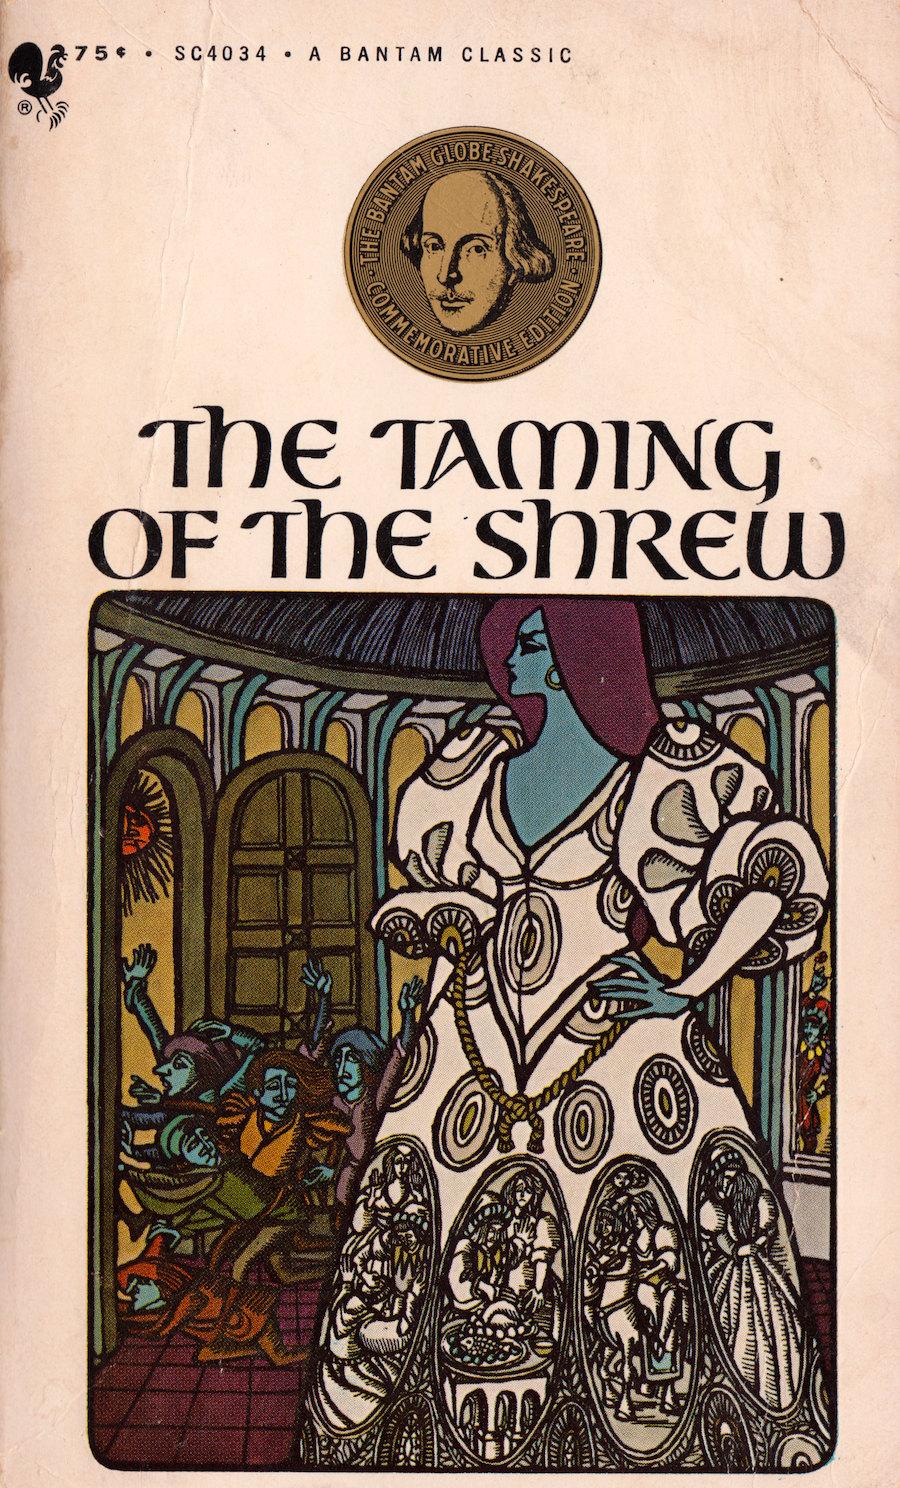 the art of leo and diane dillon shakespeare the taming of the shrew shakespeare the taming of the shrew